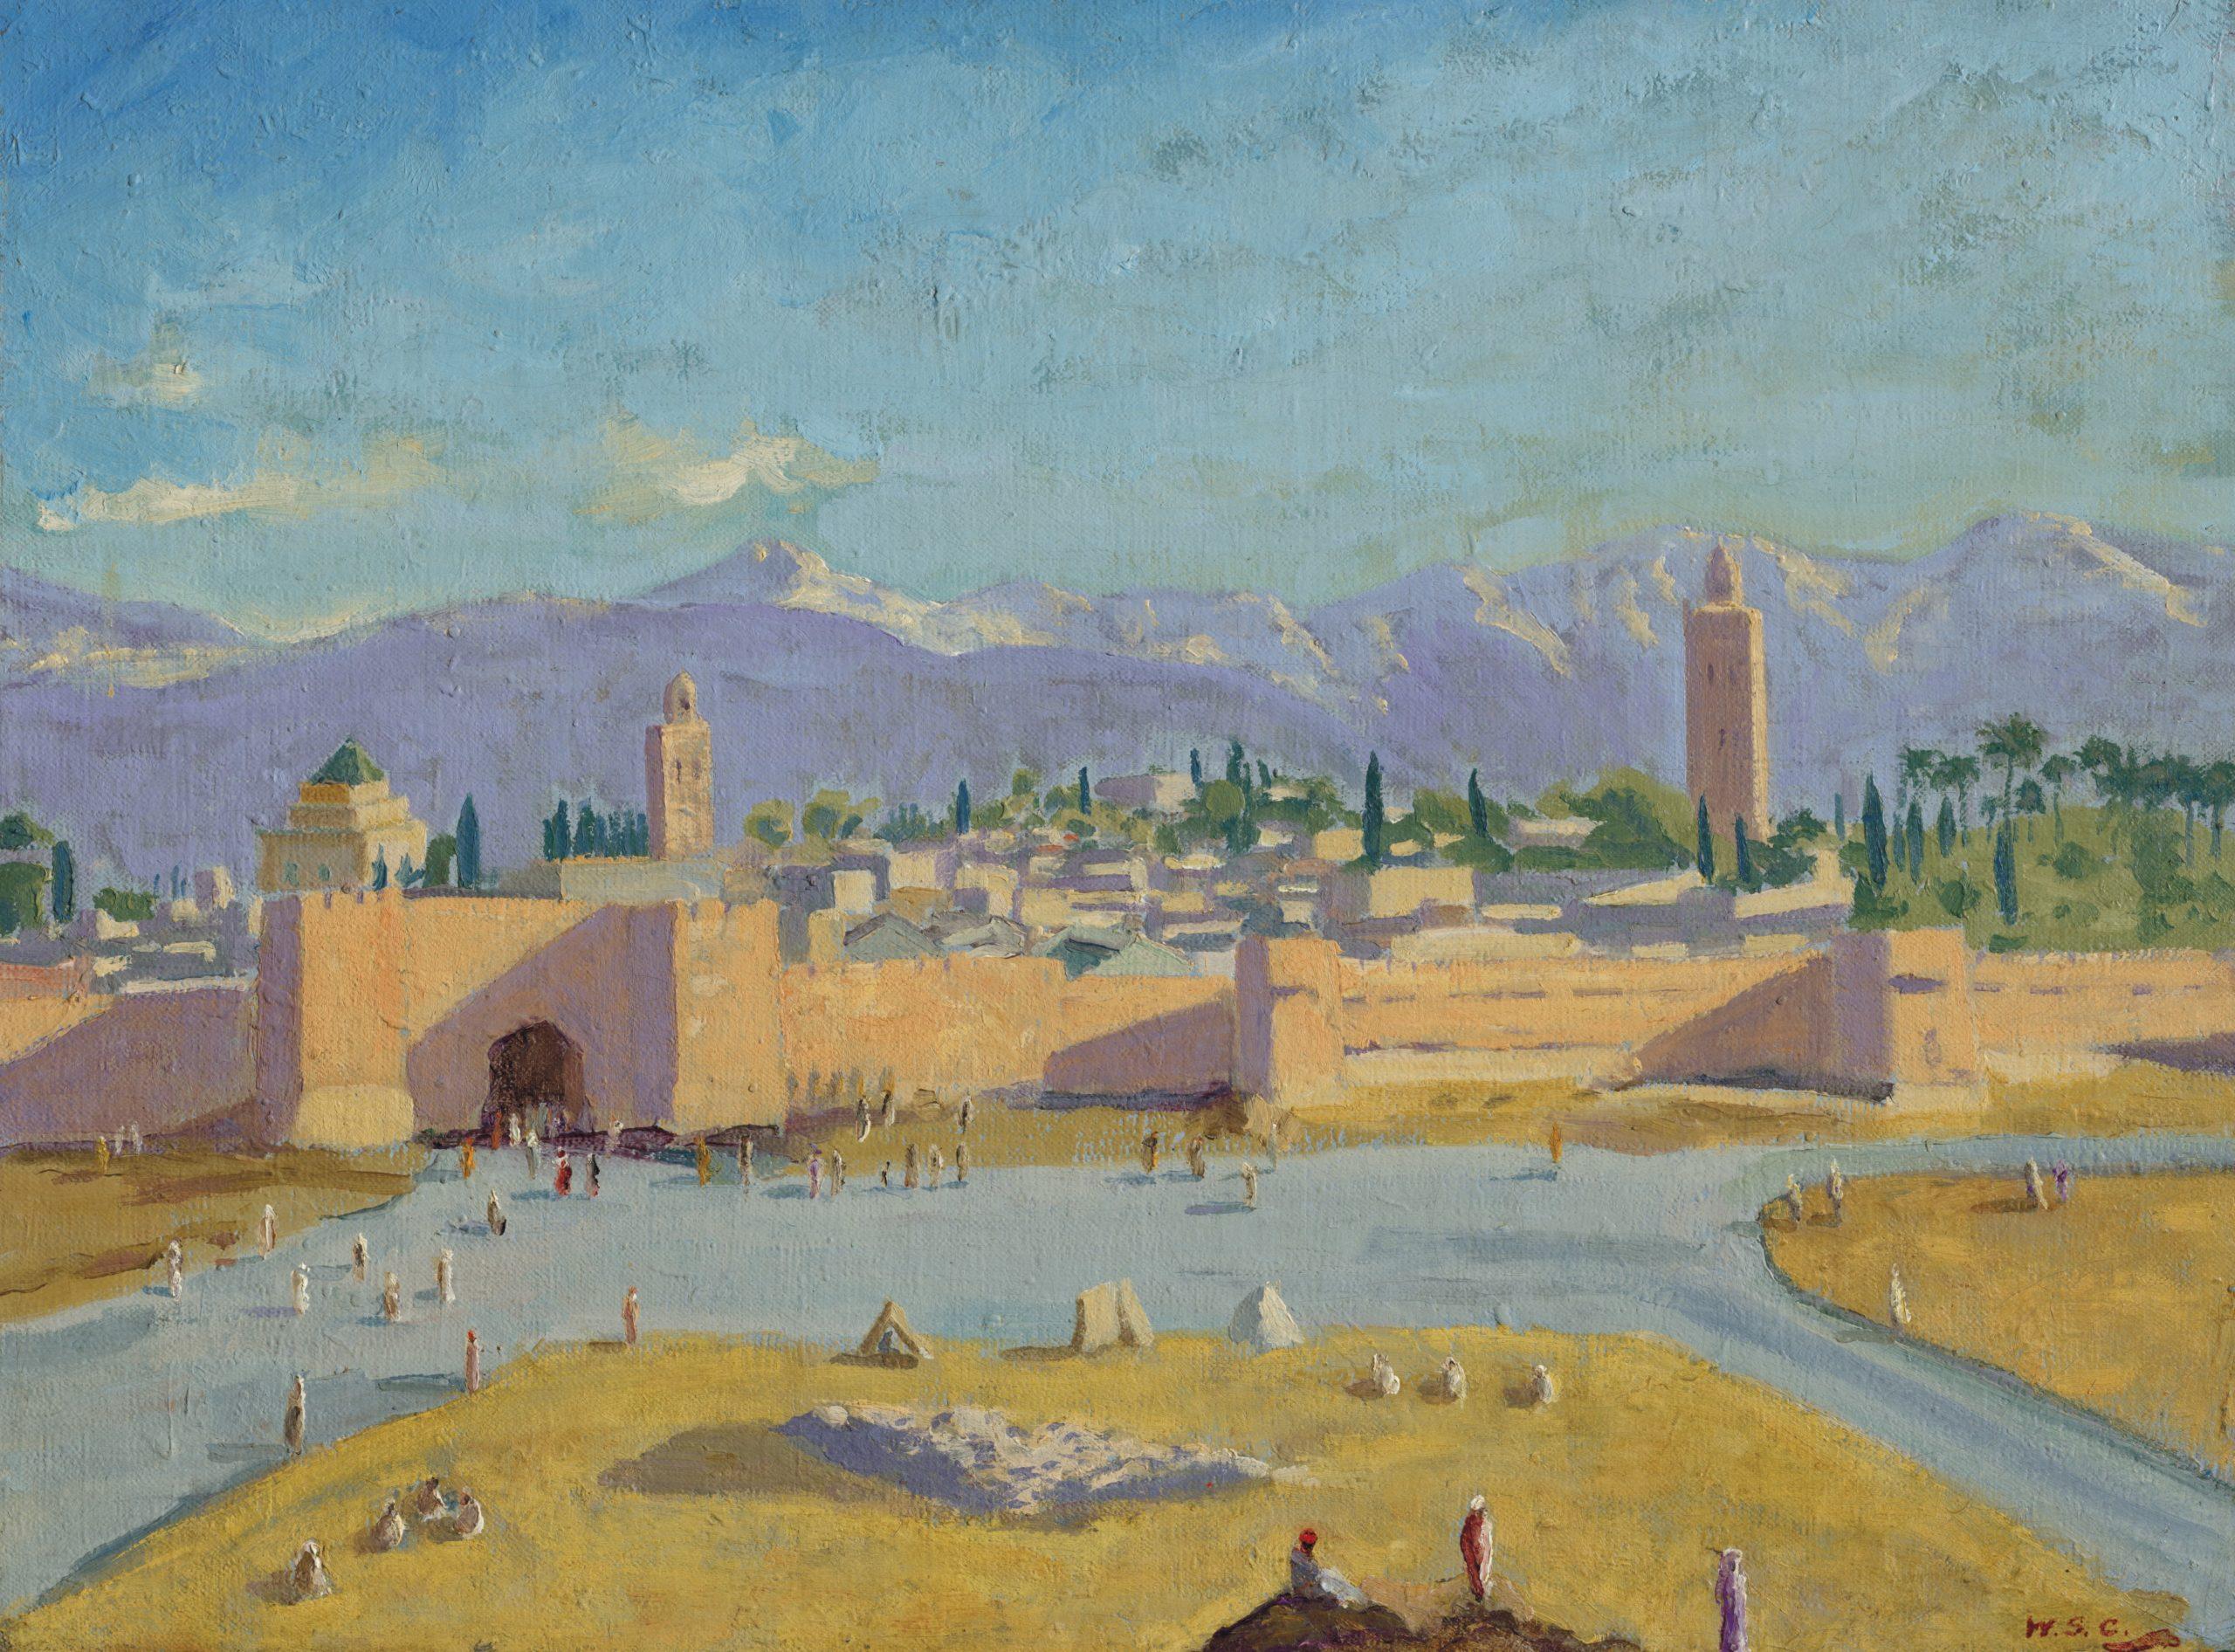 churchill's marrakesh painting